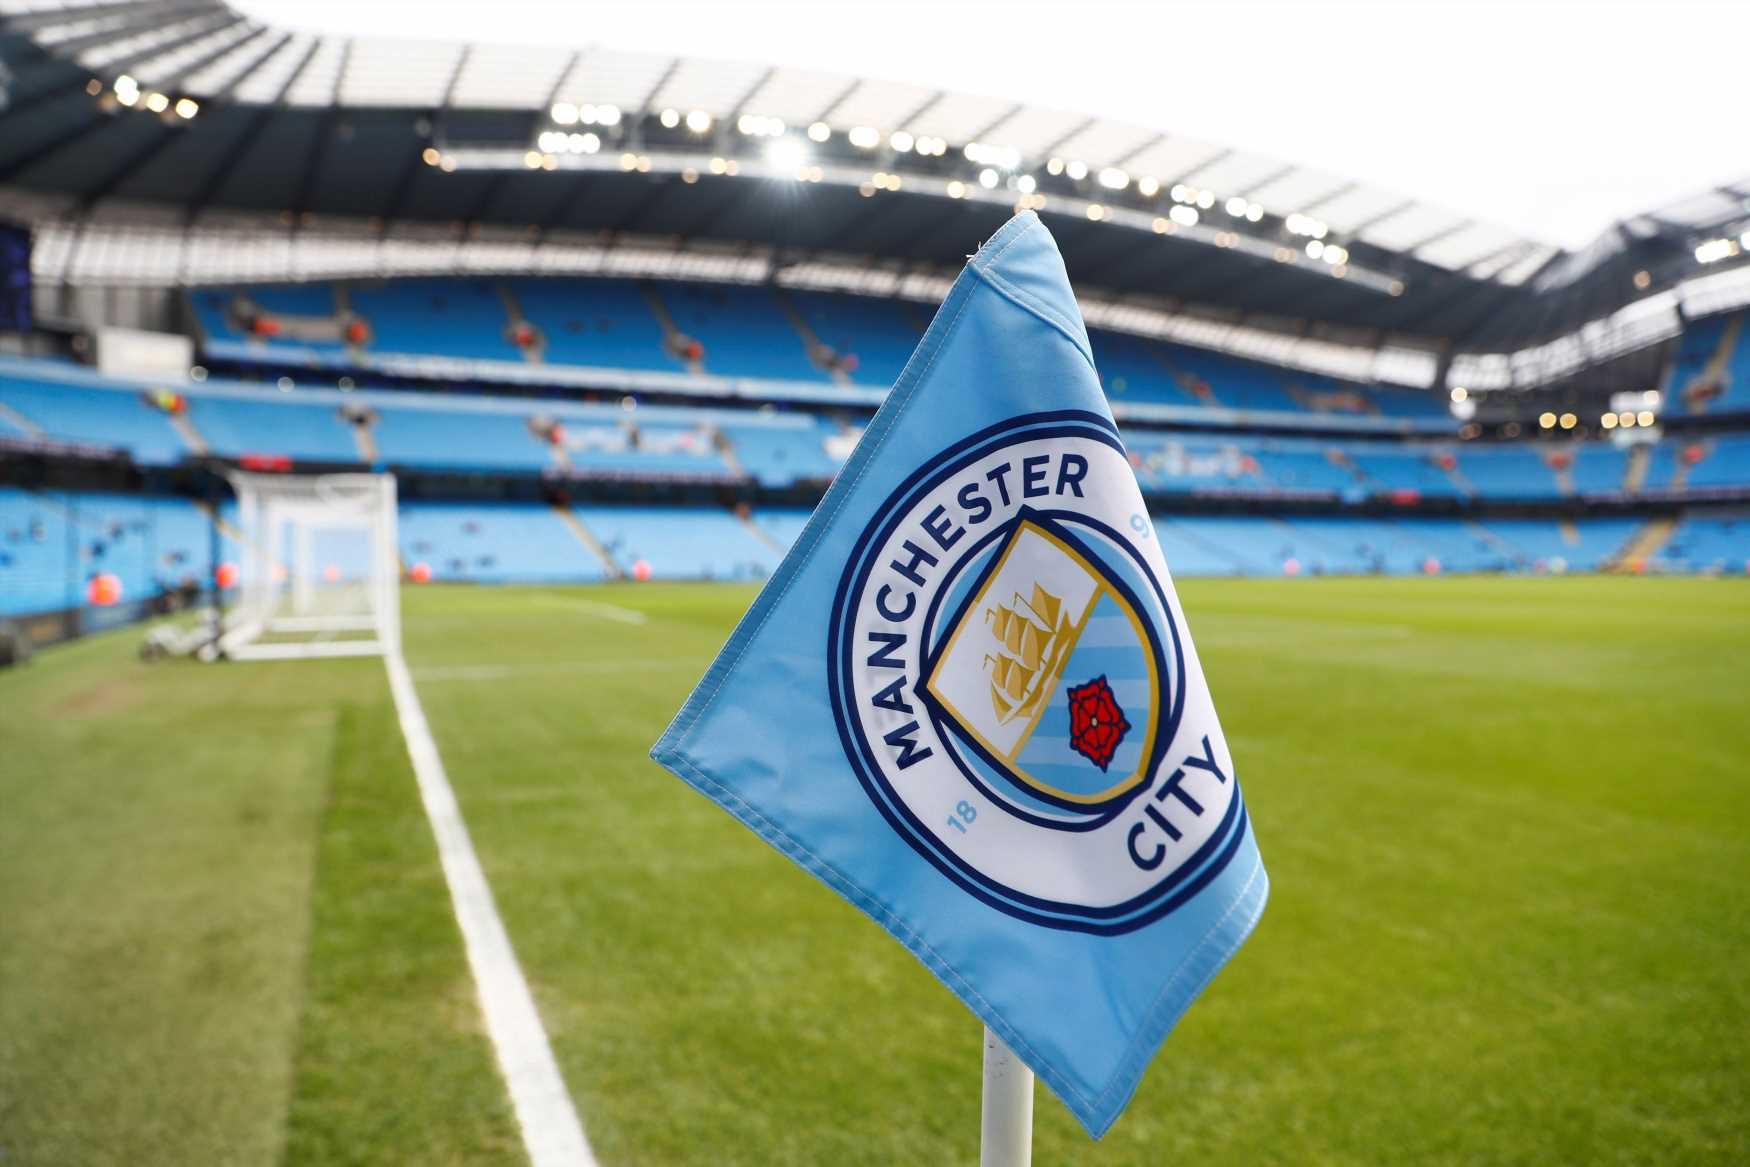 Man City sign Bolton's 14-year-old wonderkid Ogwuru for £100,000